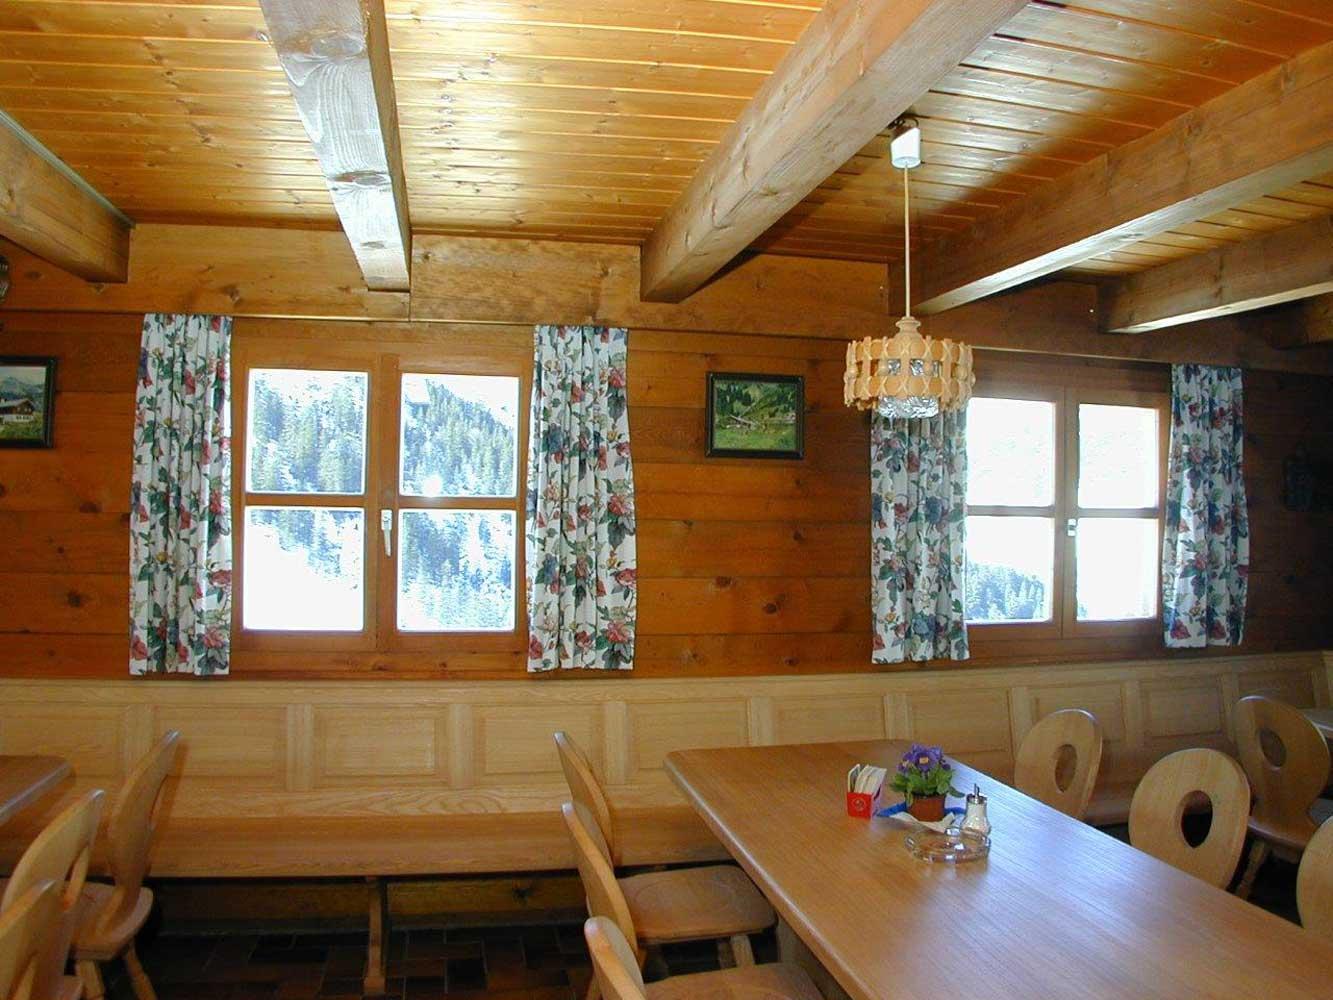 Innere Wiesalpe Kleinwalsertal, Ausflugsziel, Alpe, Brotzeit – Feste feiern!